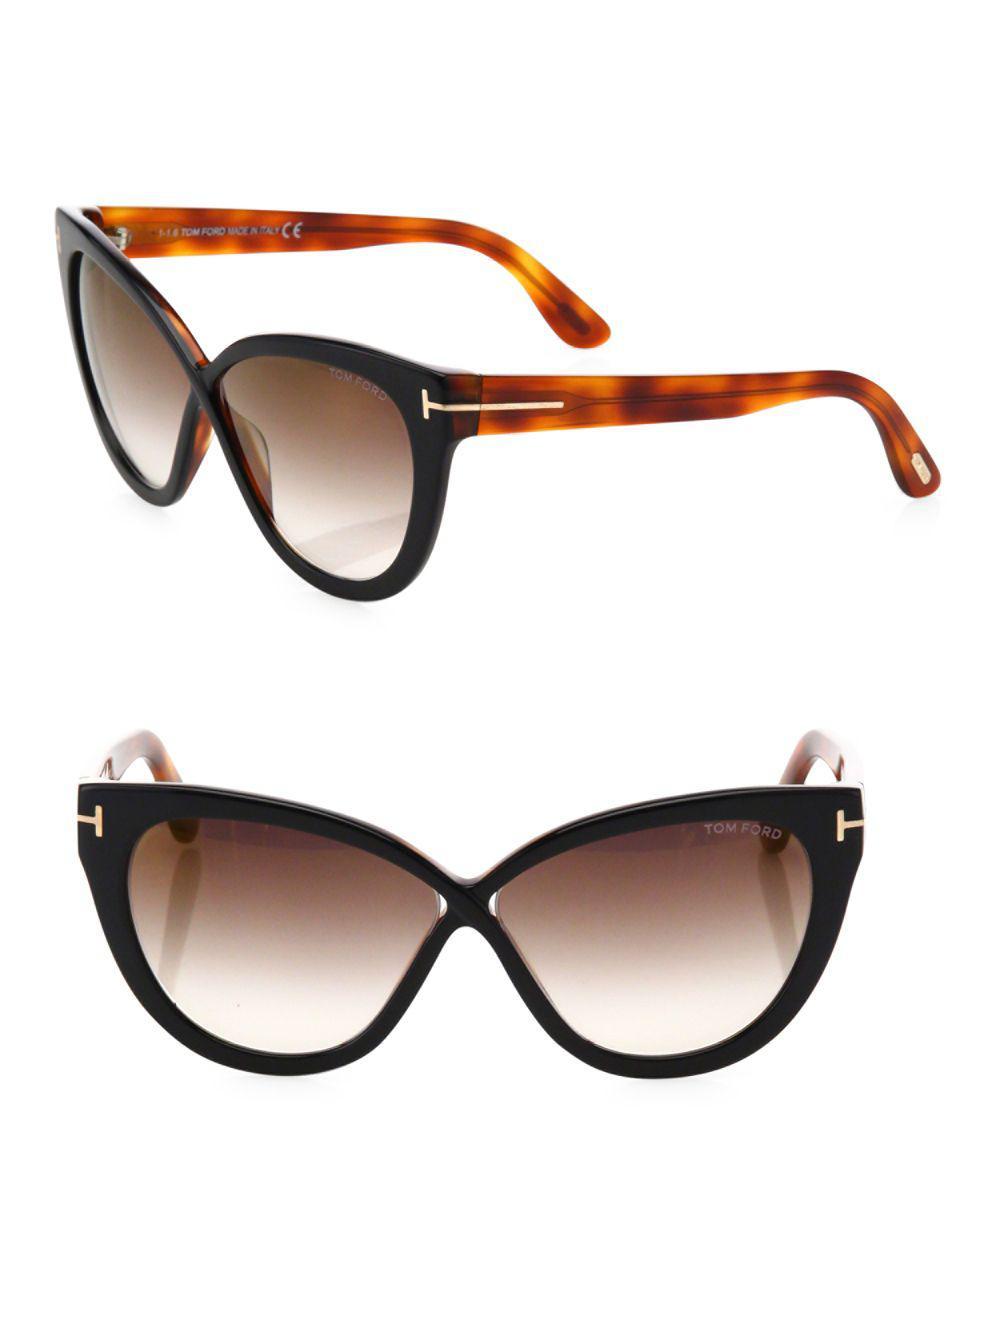 8c273c09714bc Lyst - Tom Ford Arabella 59mm Mirrored Cat Eye Sunglasses in Black